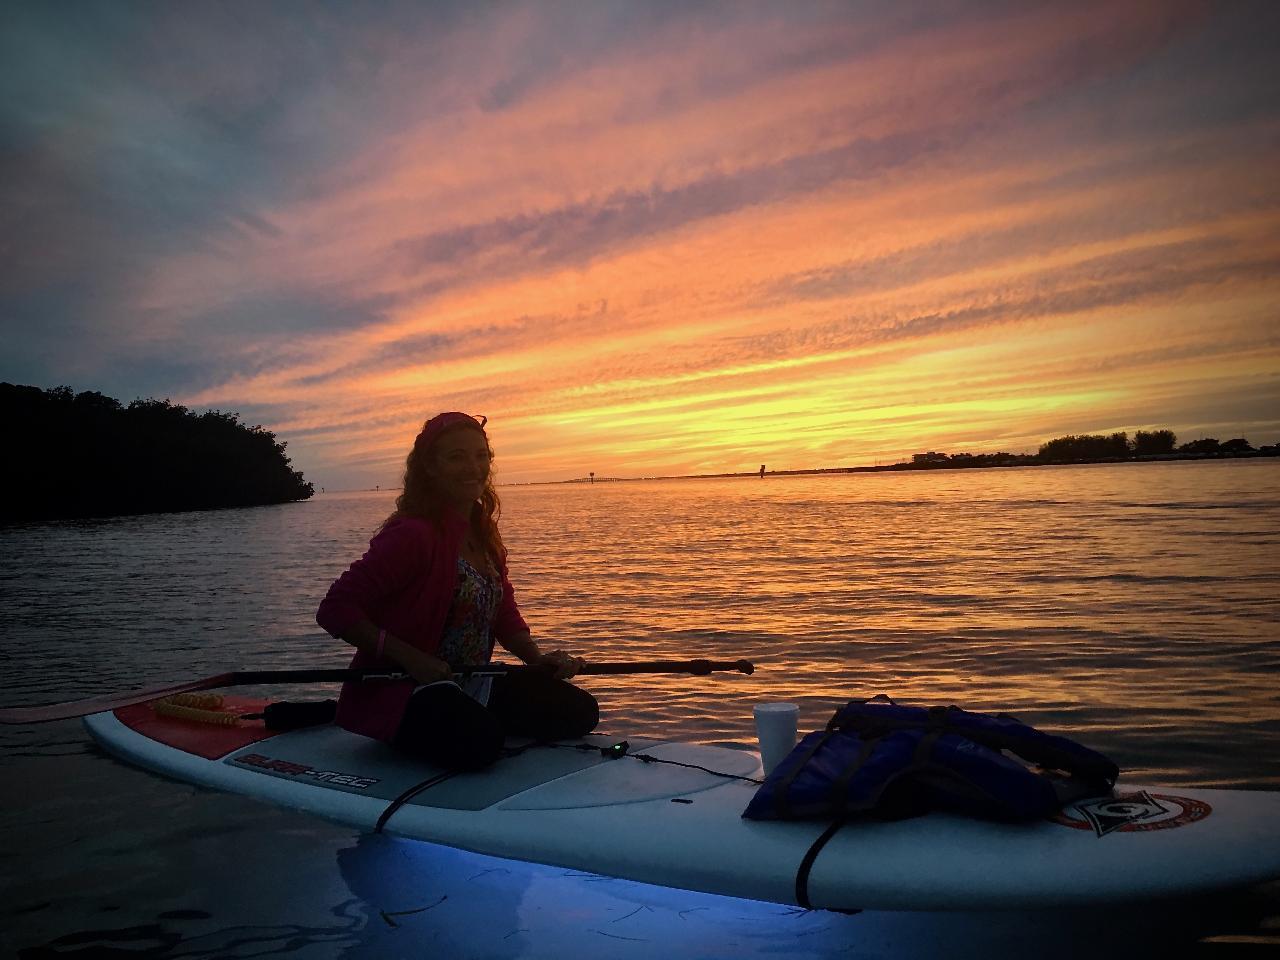 Night Kayak/SUP Lighted Florida Bay Tour @ Crane Point